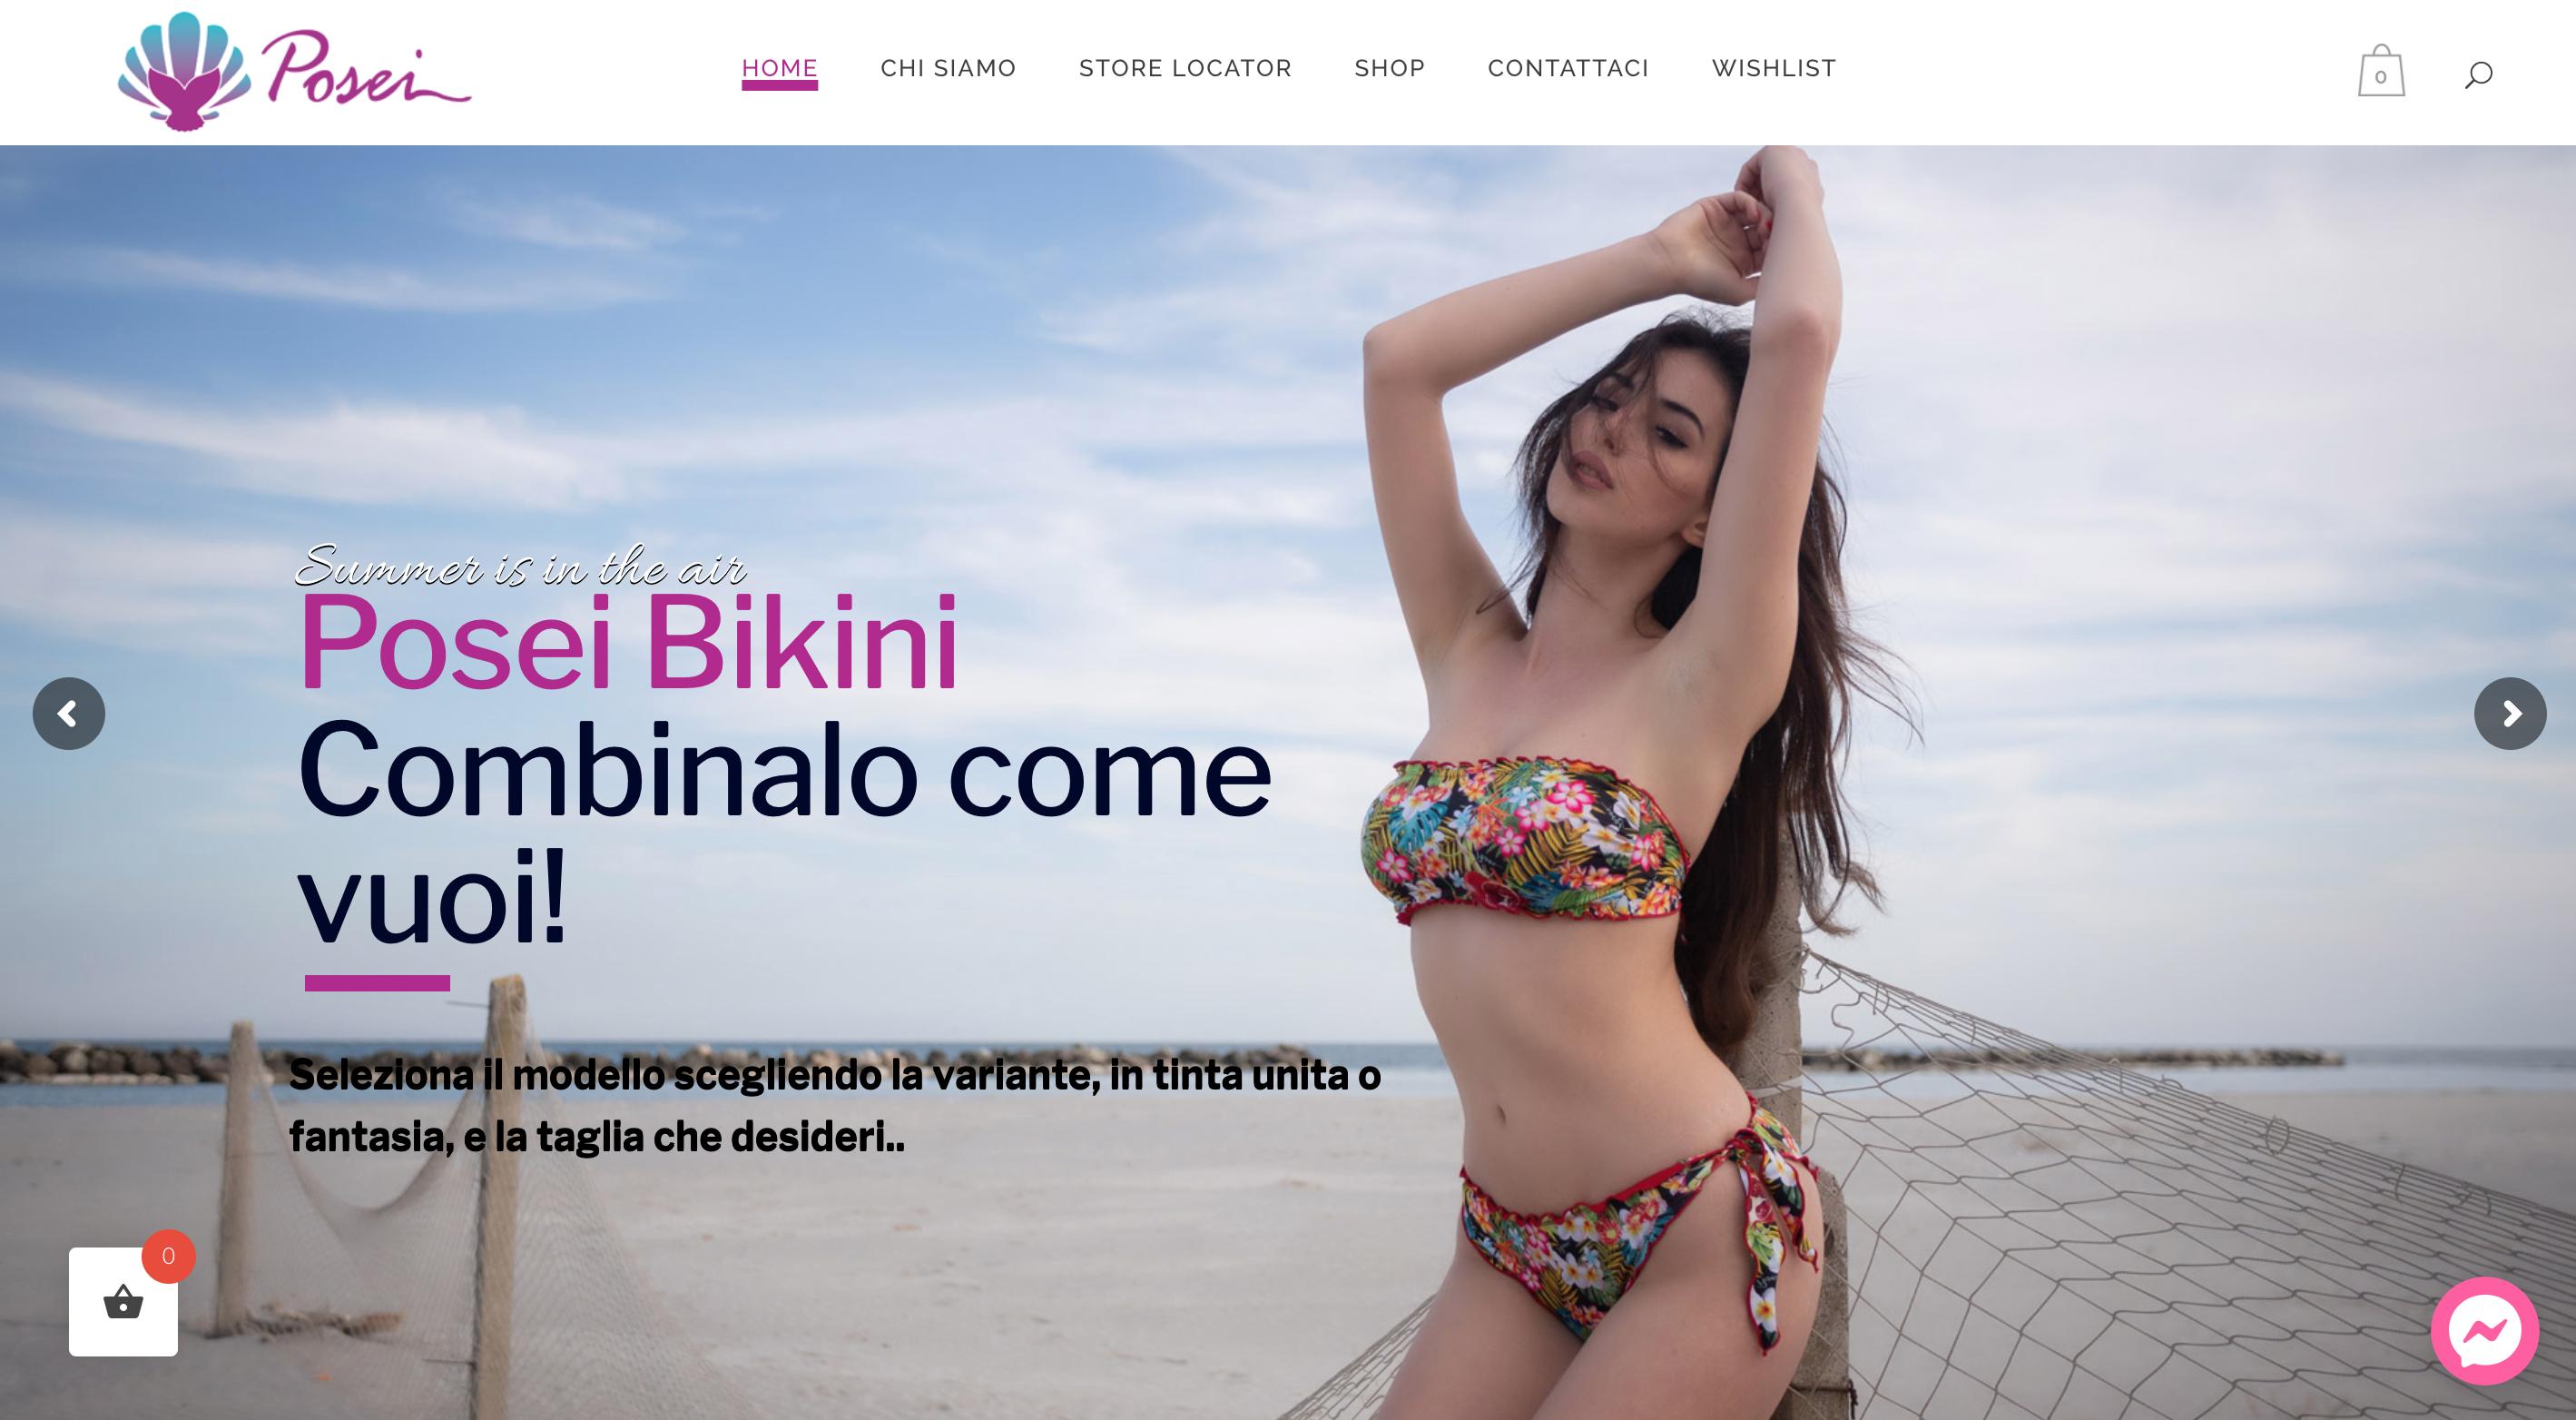 Posei Bikini